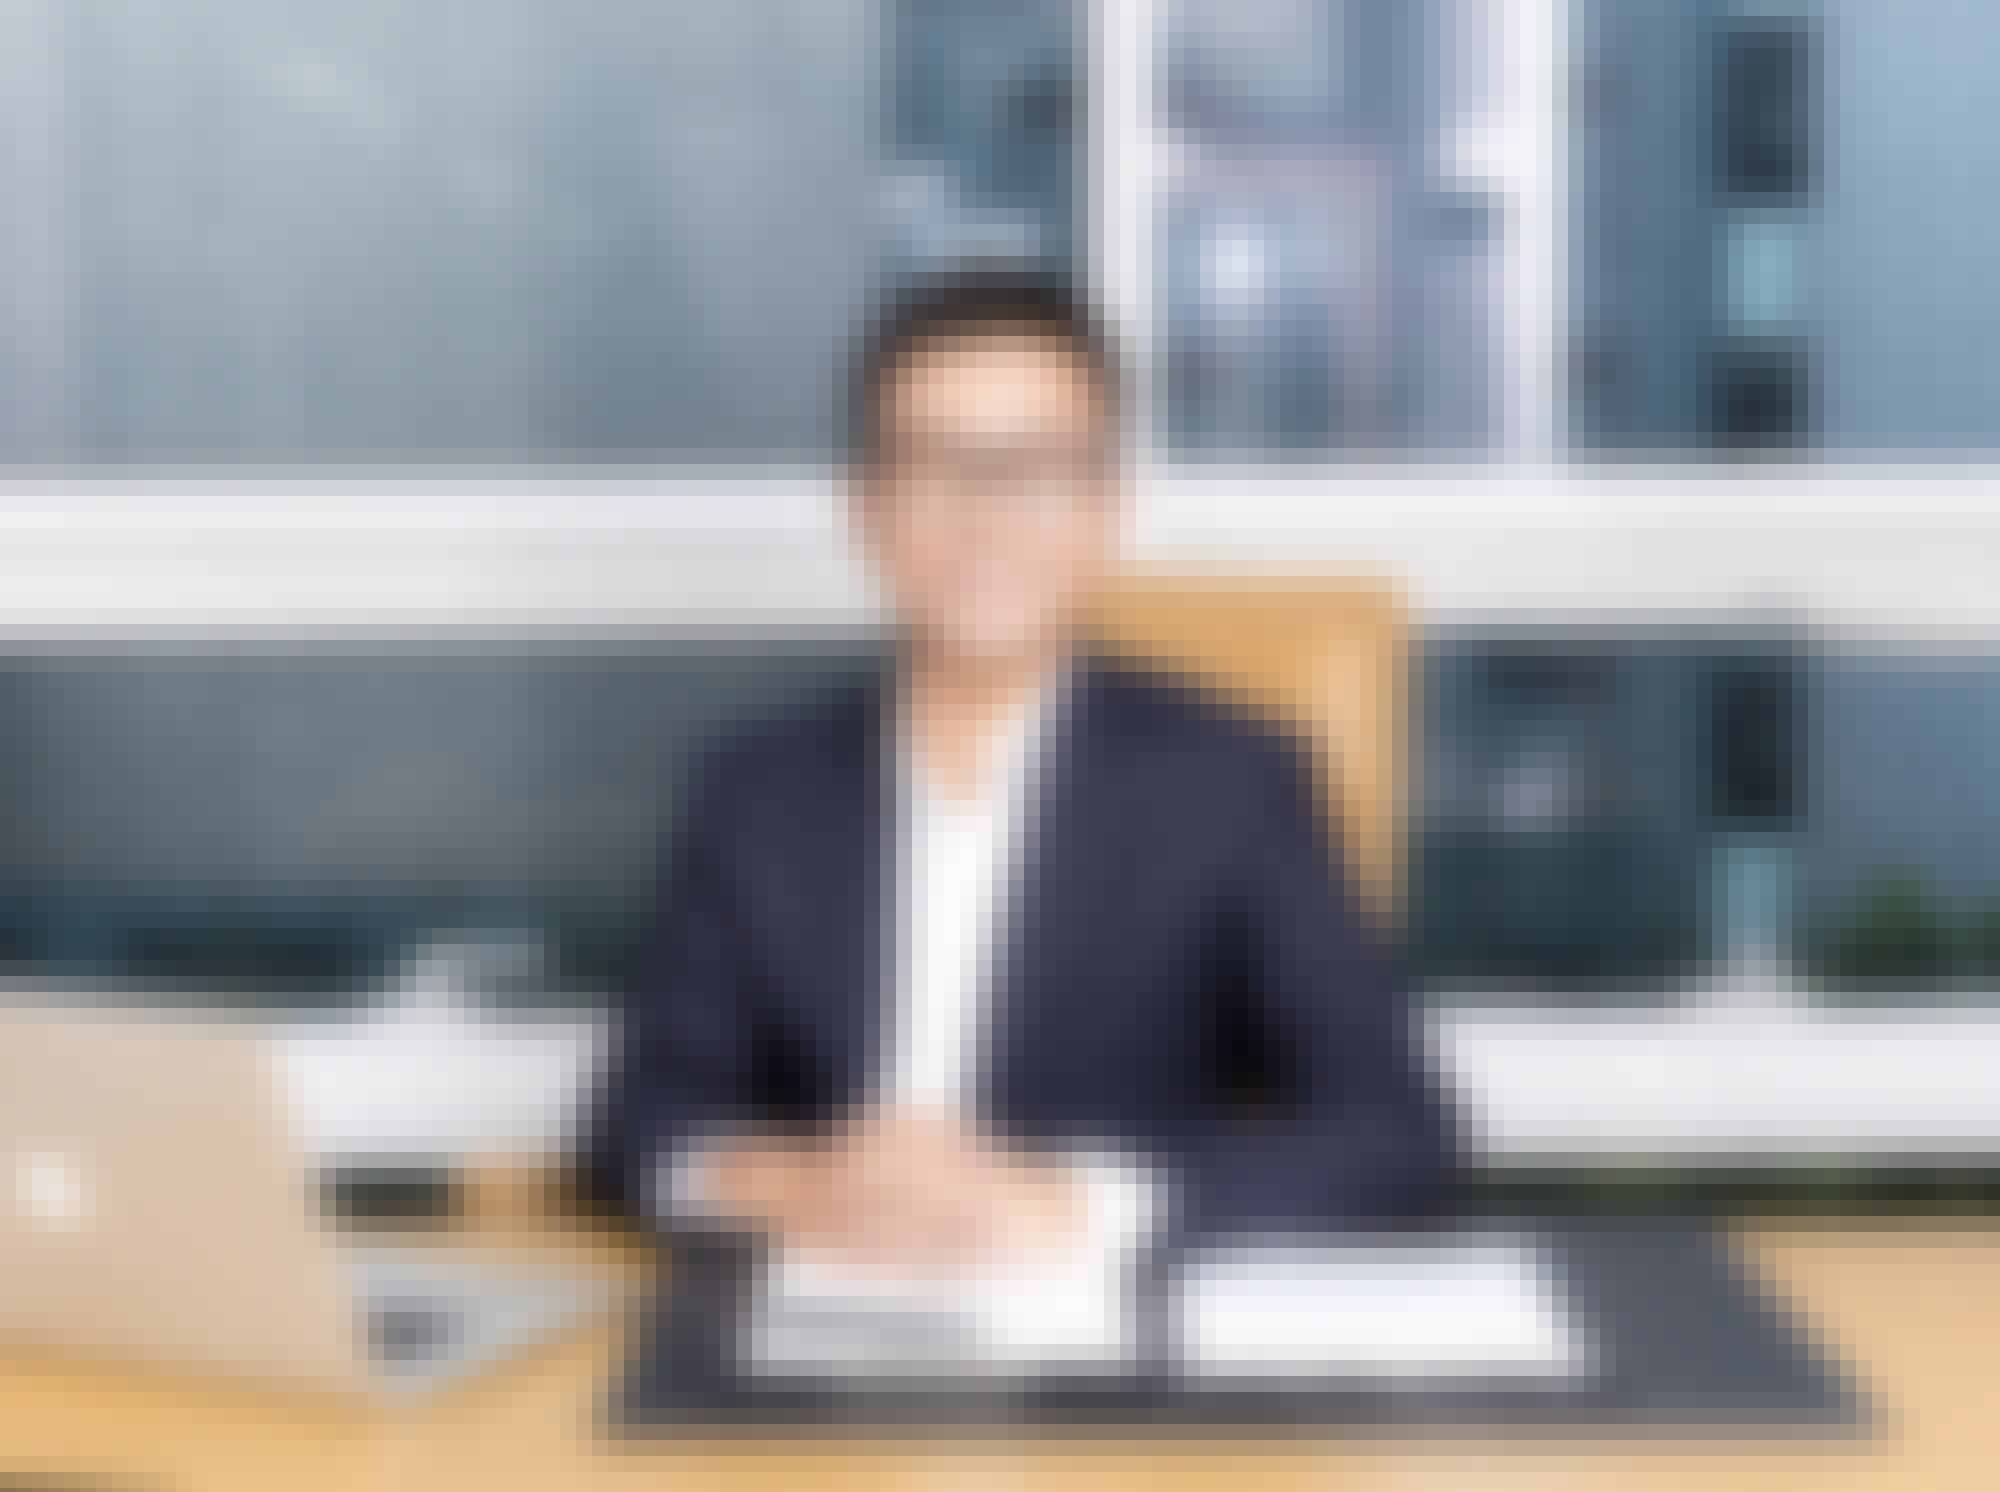 softbank-vision-fund-2-invests-160m-in-media-localization-provider-iyuno-sdi-group